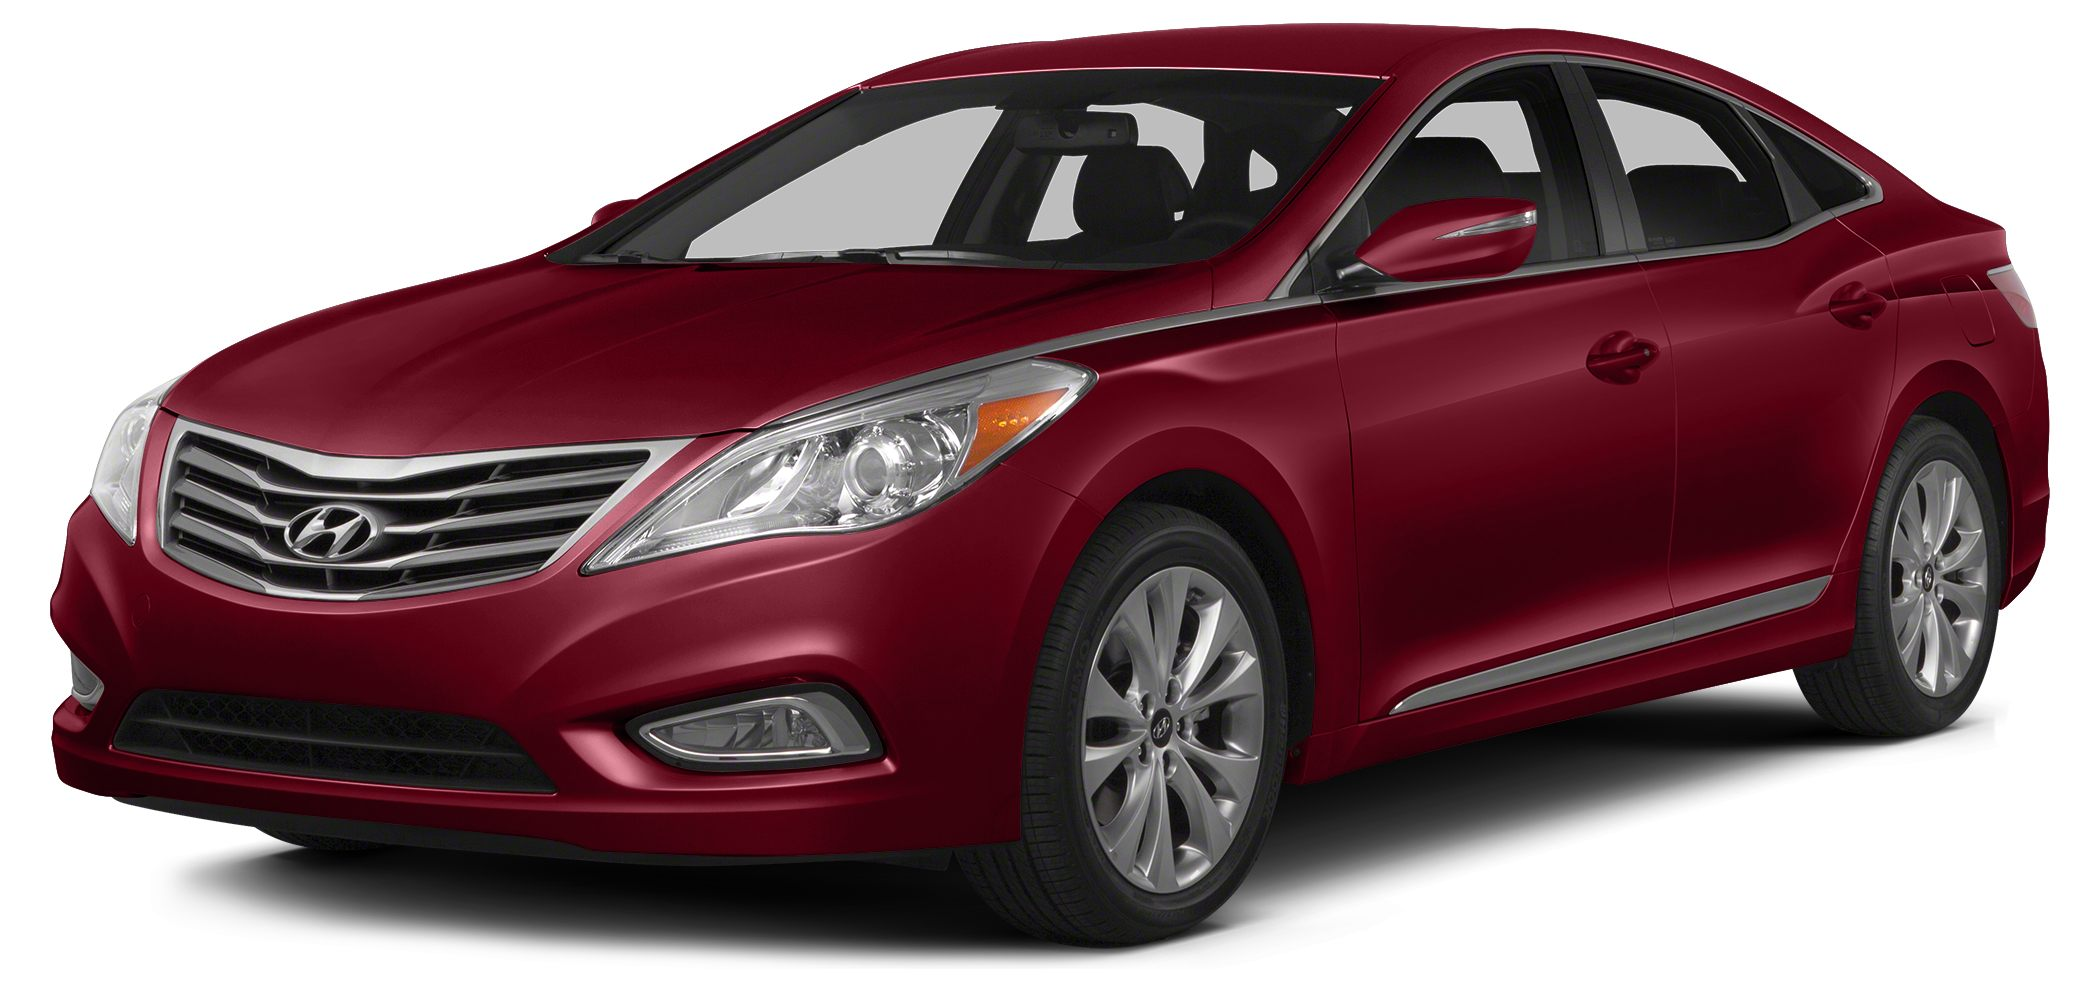 2014 Hyundai Azera Base ONE OWNER and Clean Carfax Hyundai Certified 4D Sedan V6 6-Speed A